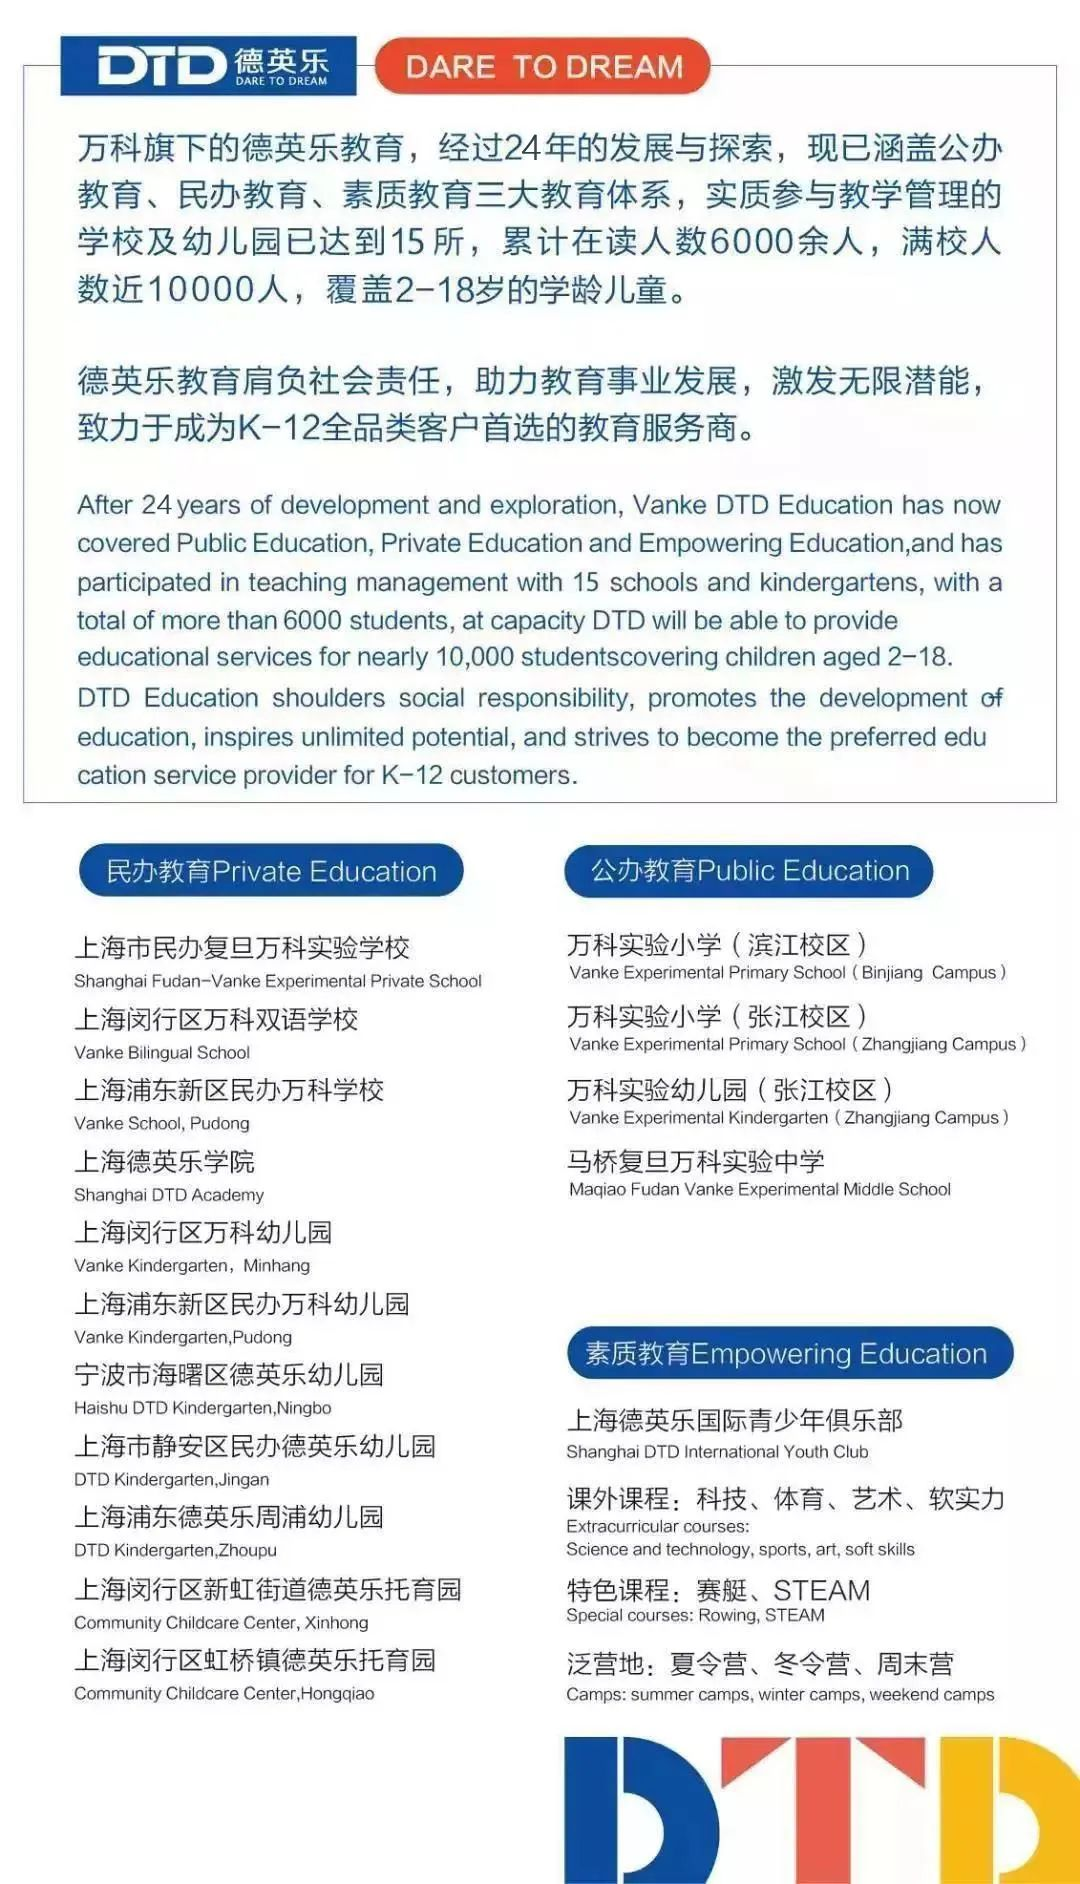 offer 合集 | 集齐英国、美国、加拿大、香港等主流留学国家和地区offer